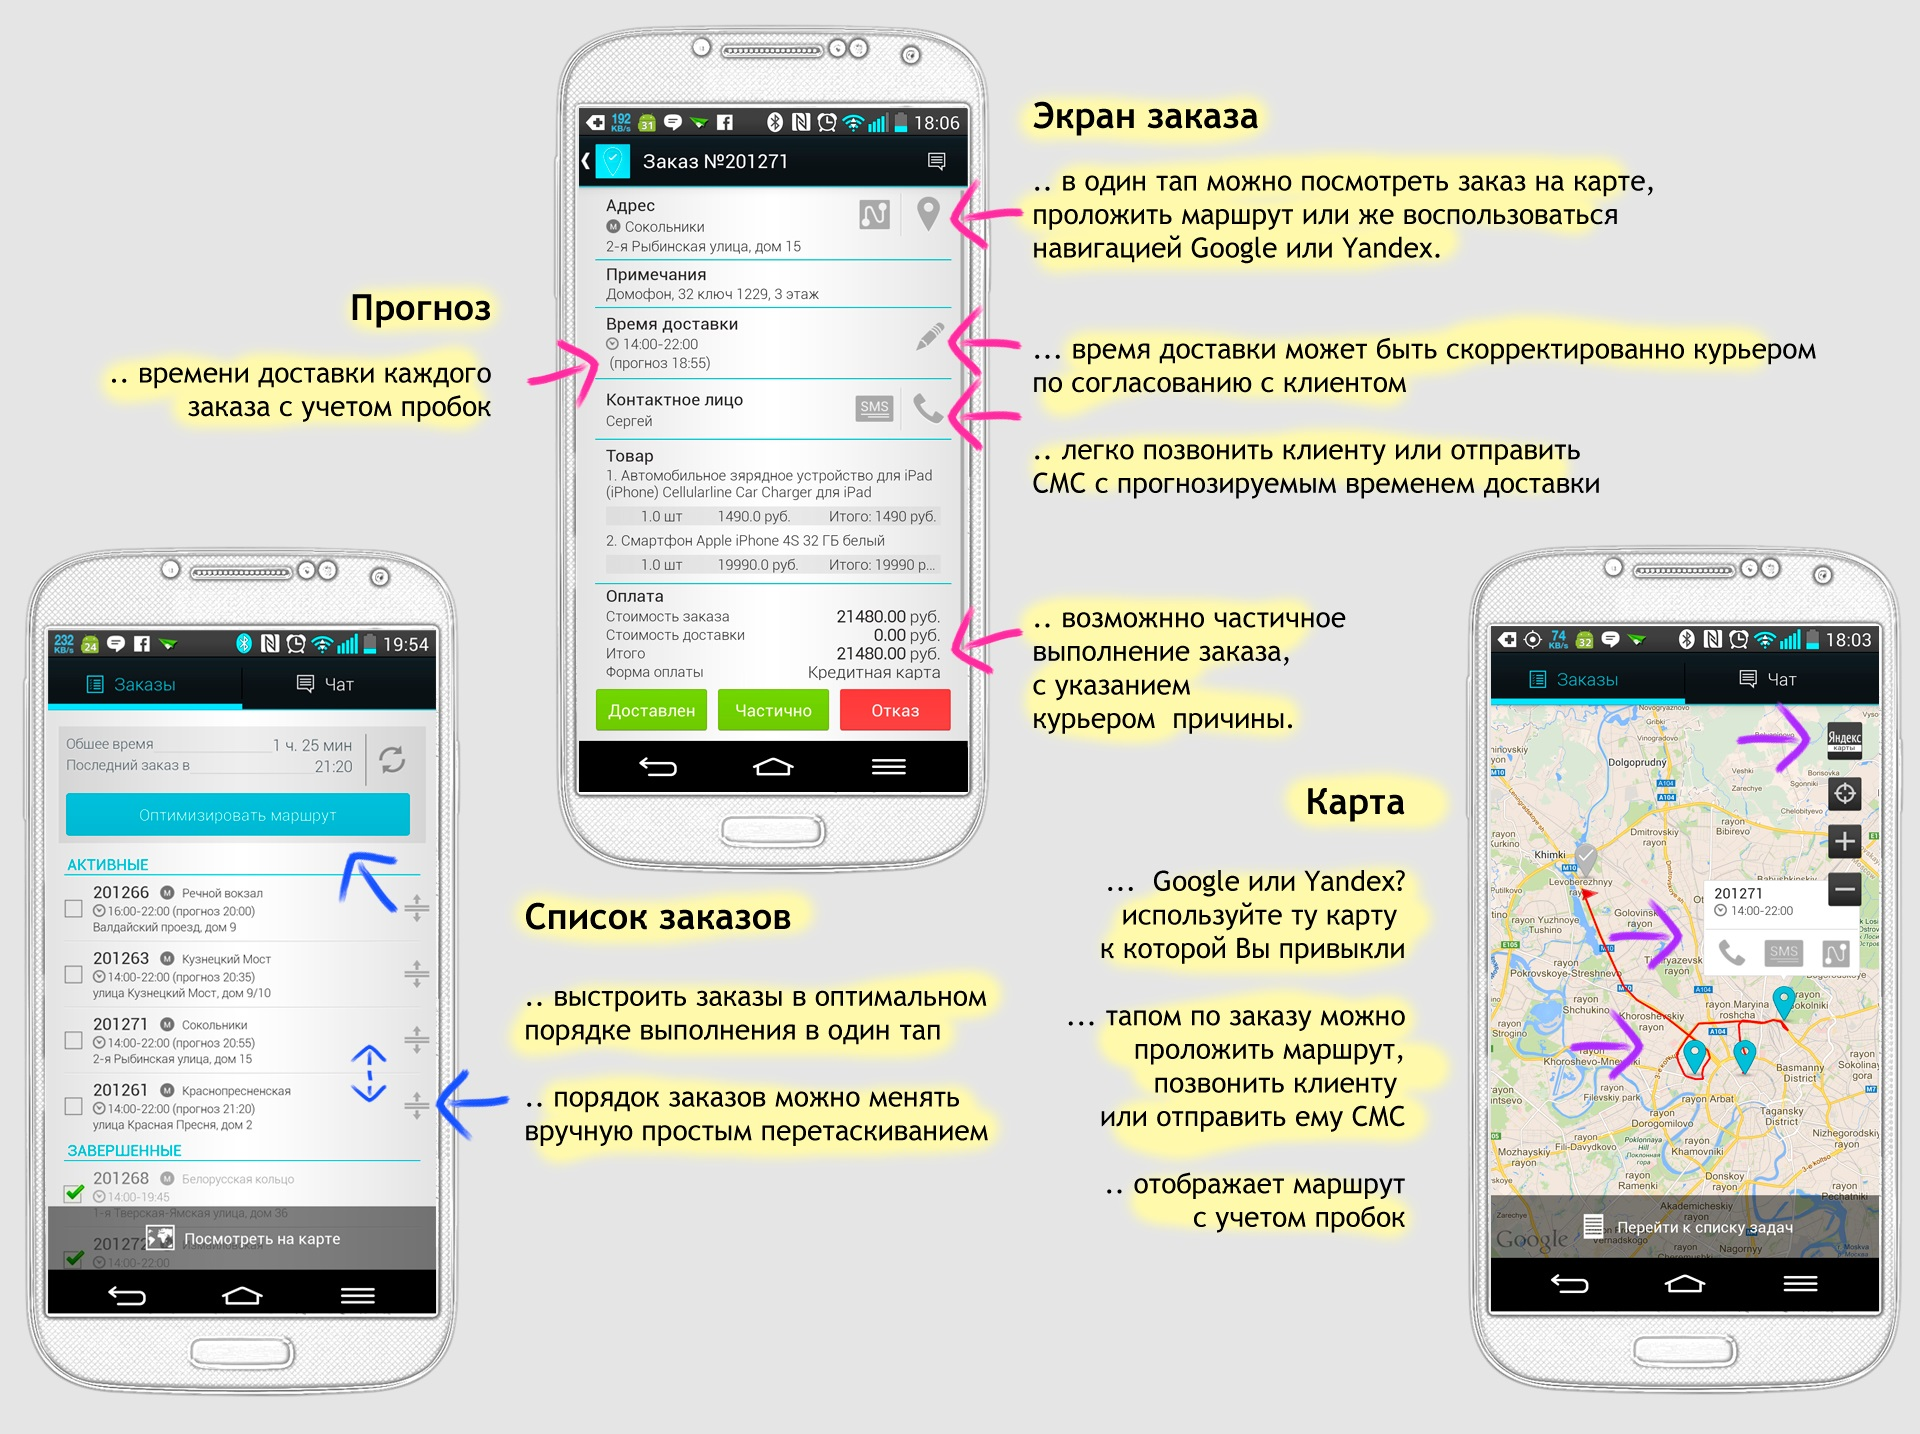 http://oborot.ru/images/articles/deliverator_kurjer.jpg